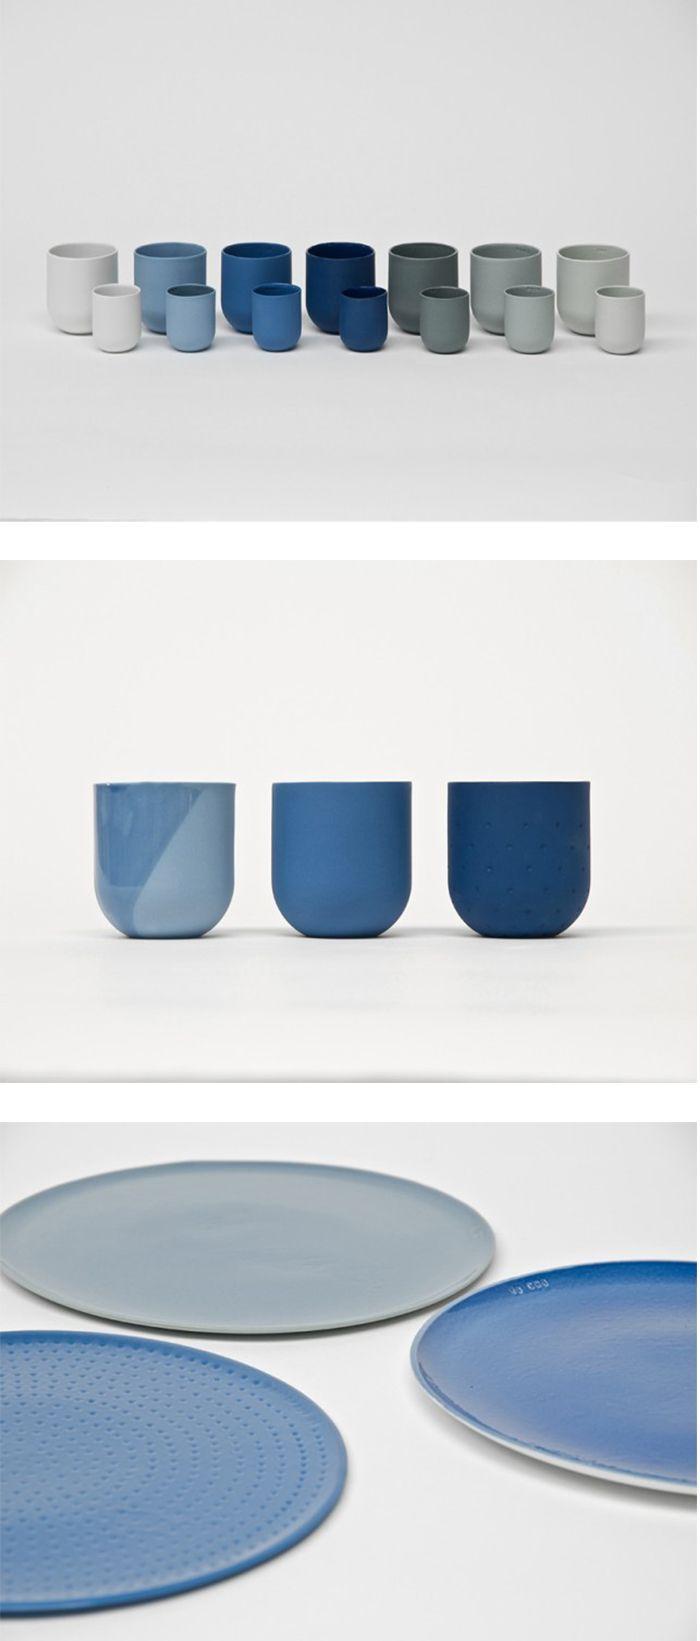 115 Reference Of Porcelain Tableware Manufacturing Process In 2020 Porcelain Tableware Ceramic Design Ceramics